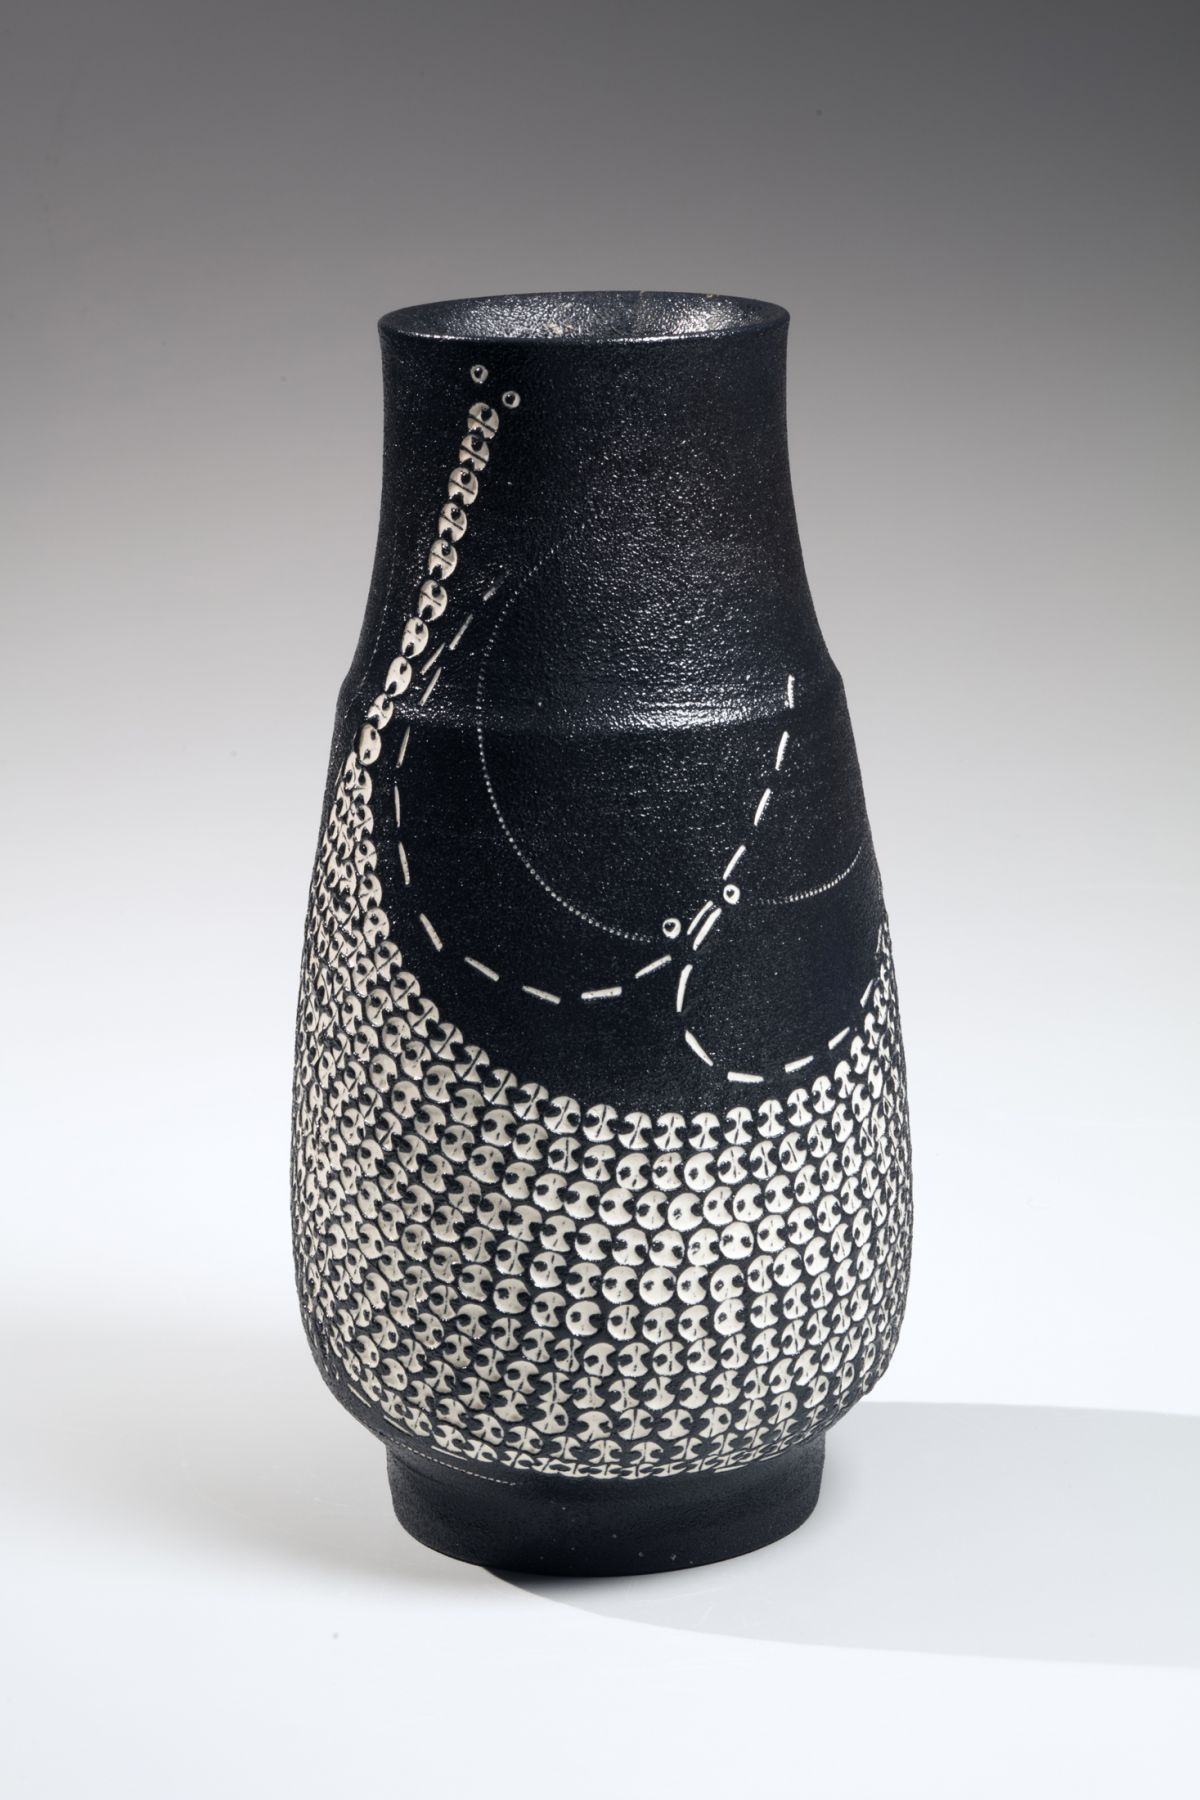 Kondō Yutaka (1932-1983), Elongated, standing black glazed vase